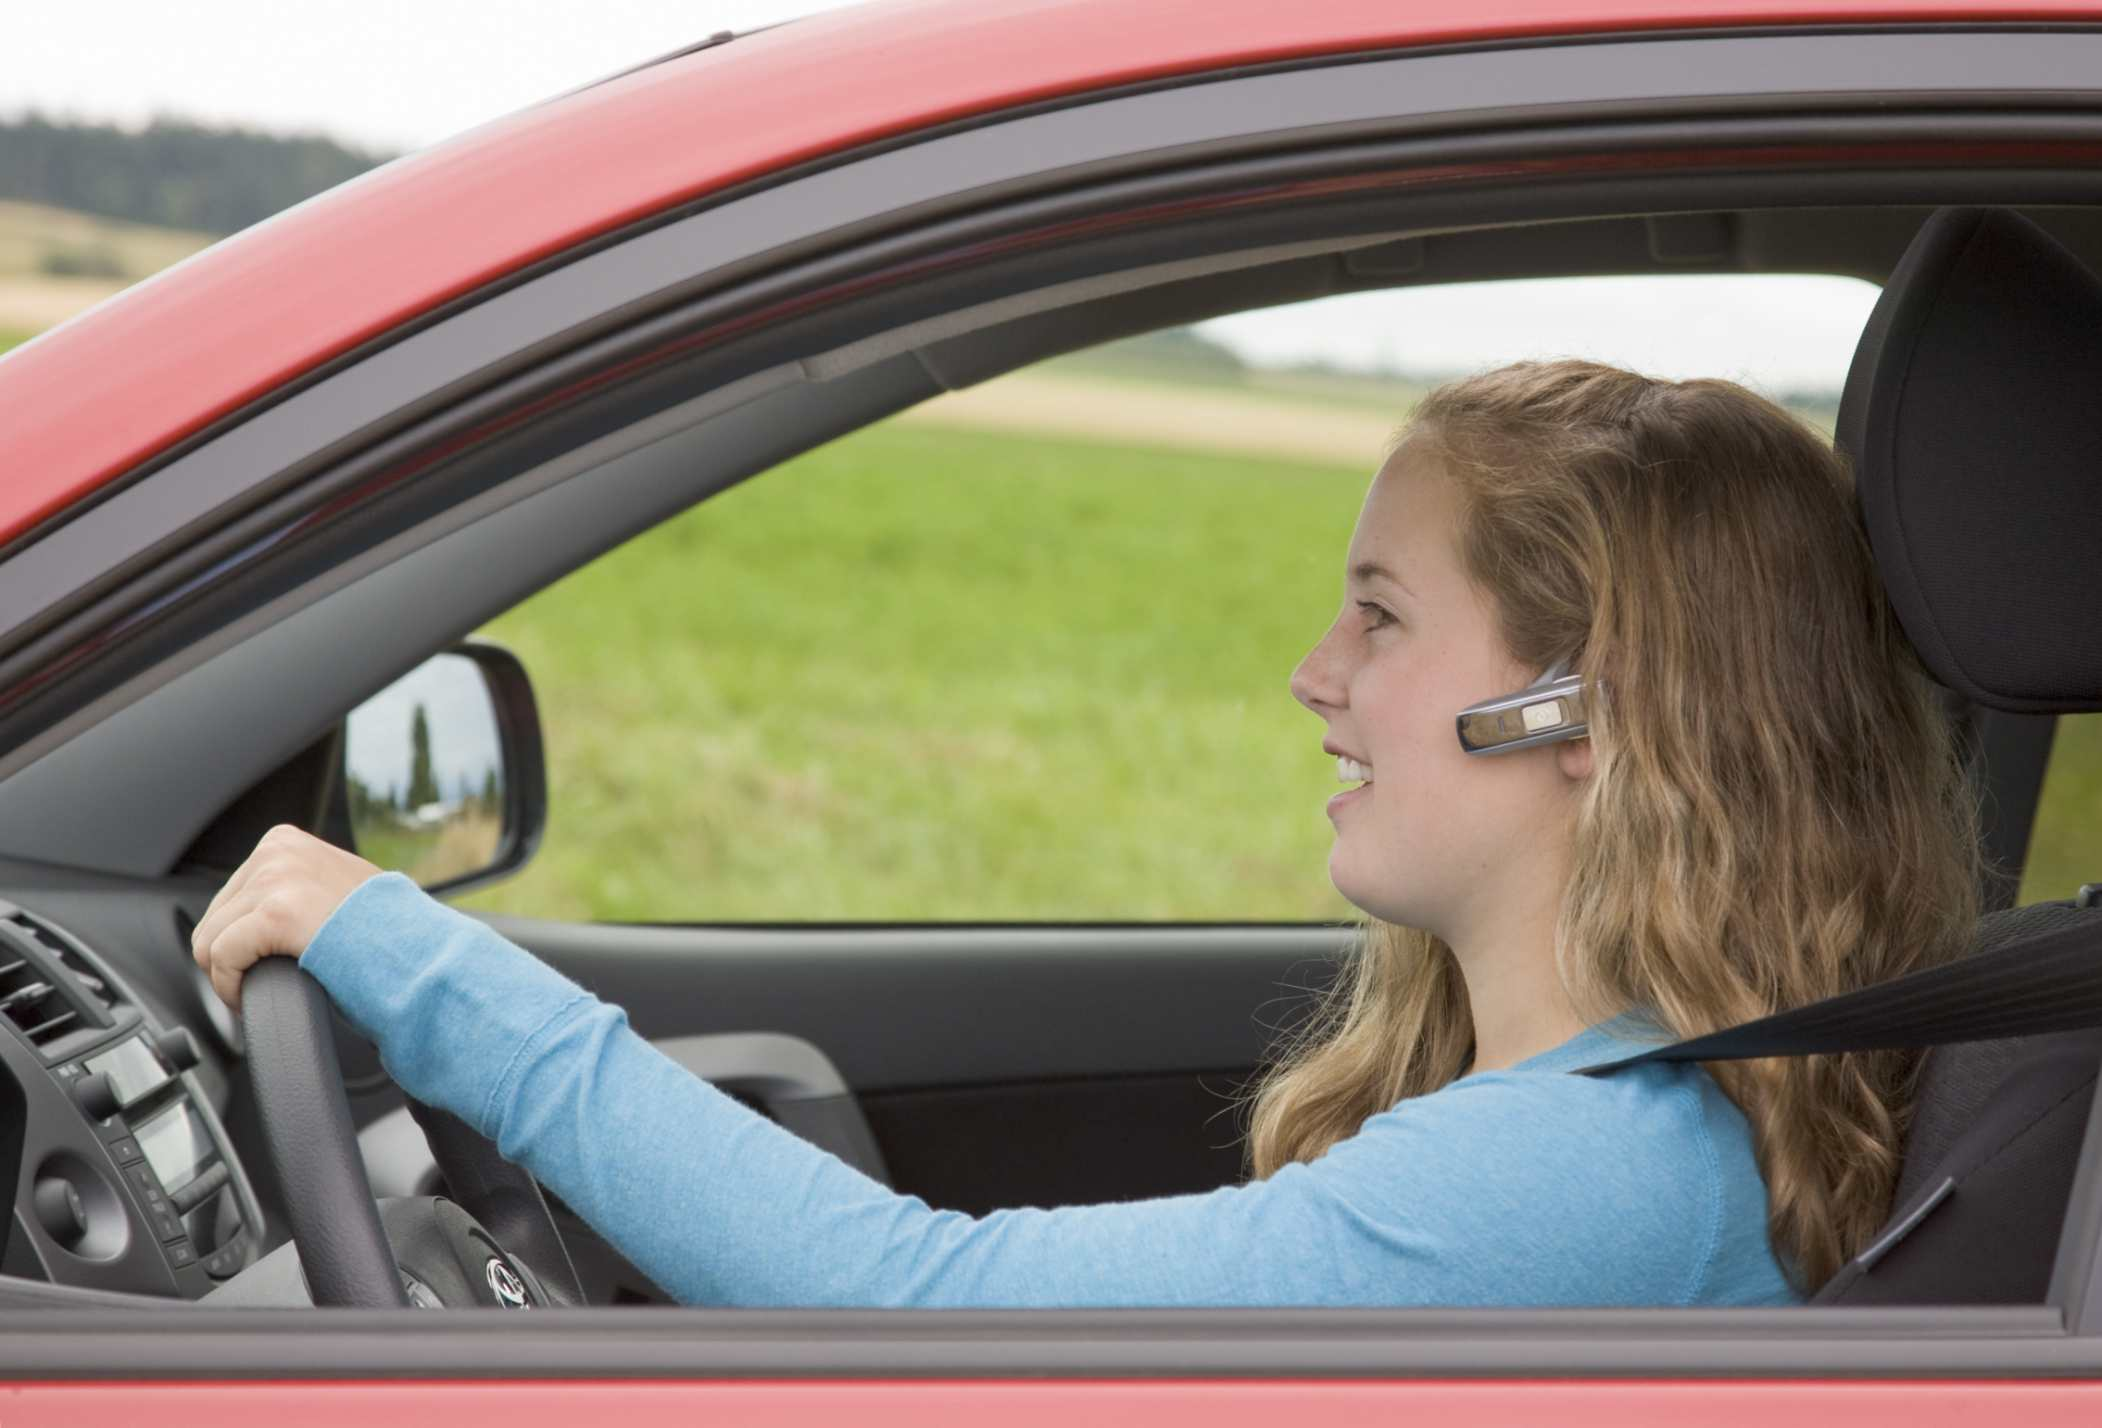 Hands-free Bluetooth phone call